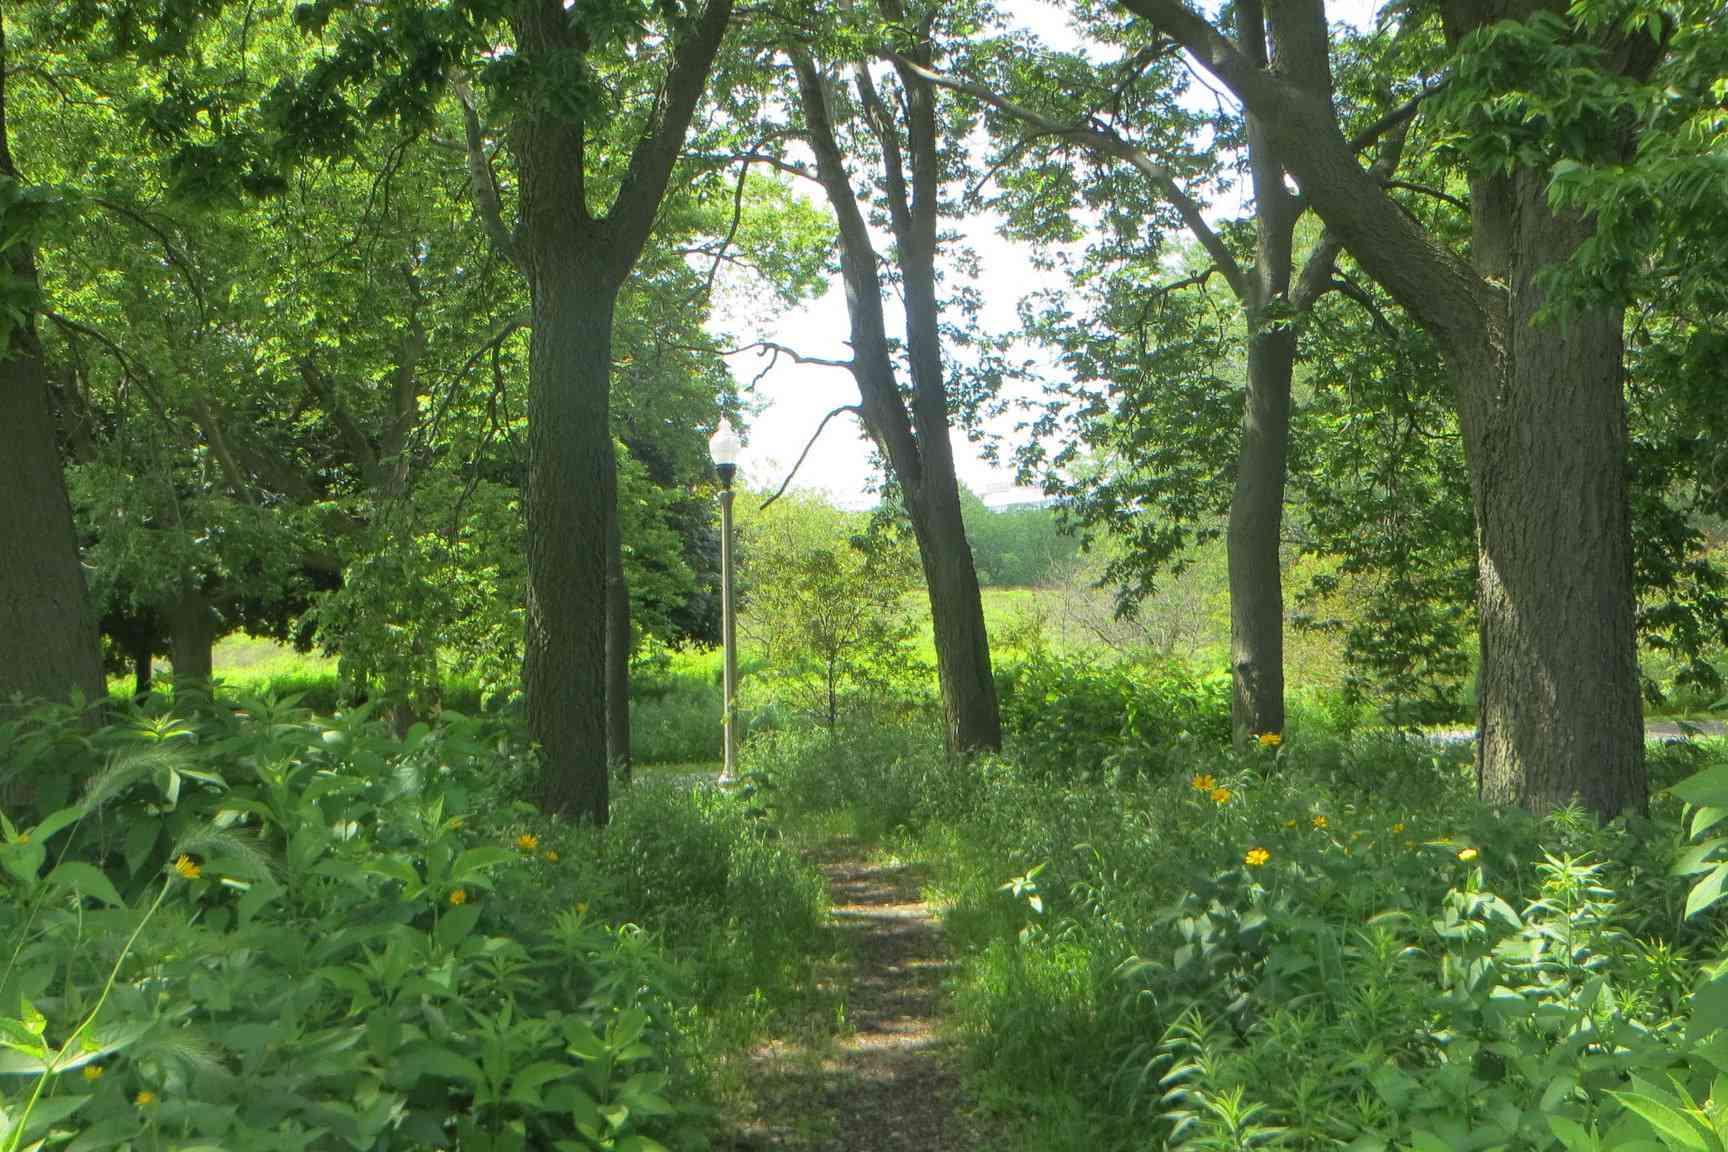 Trees and grass in the Burnham wildlife corridor, Chicago